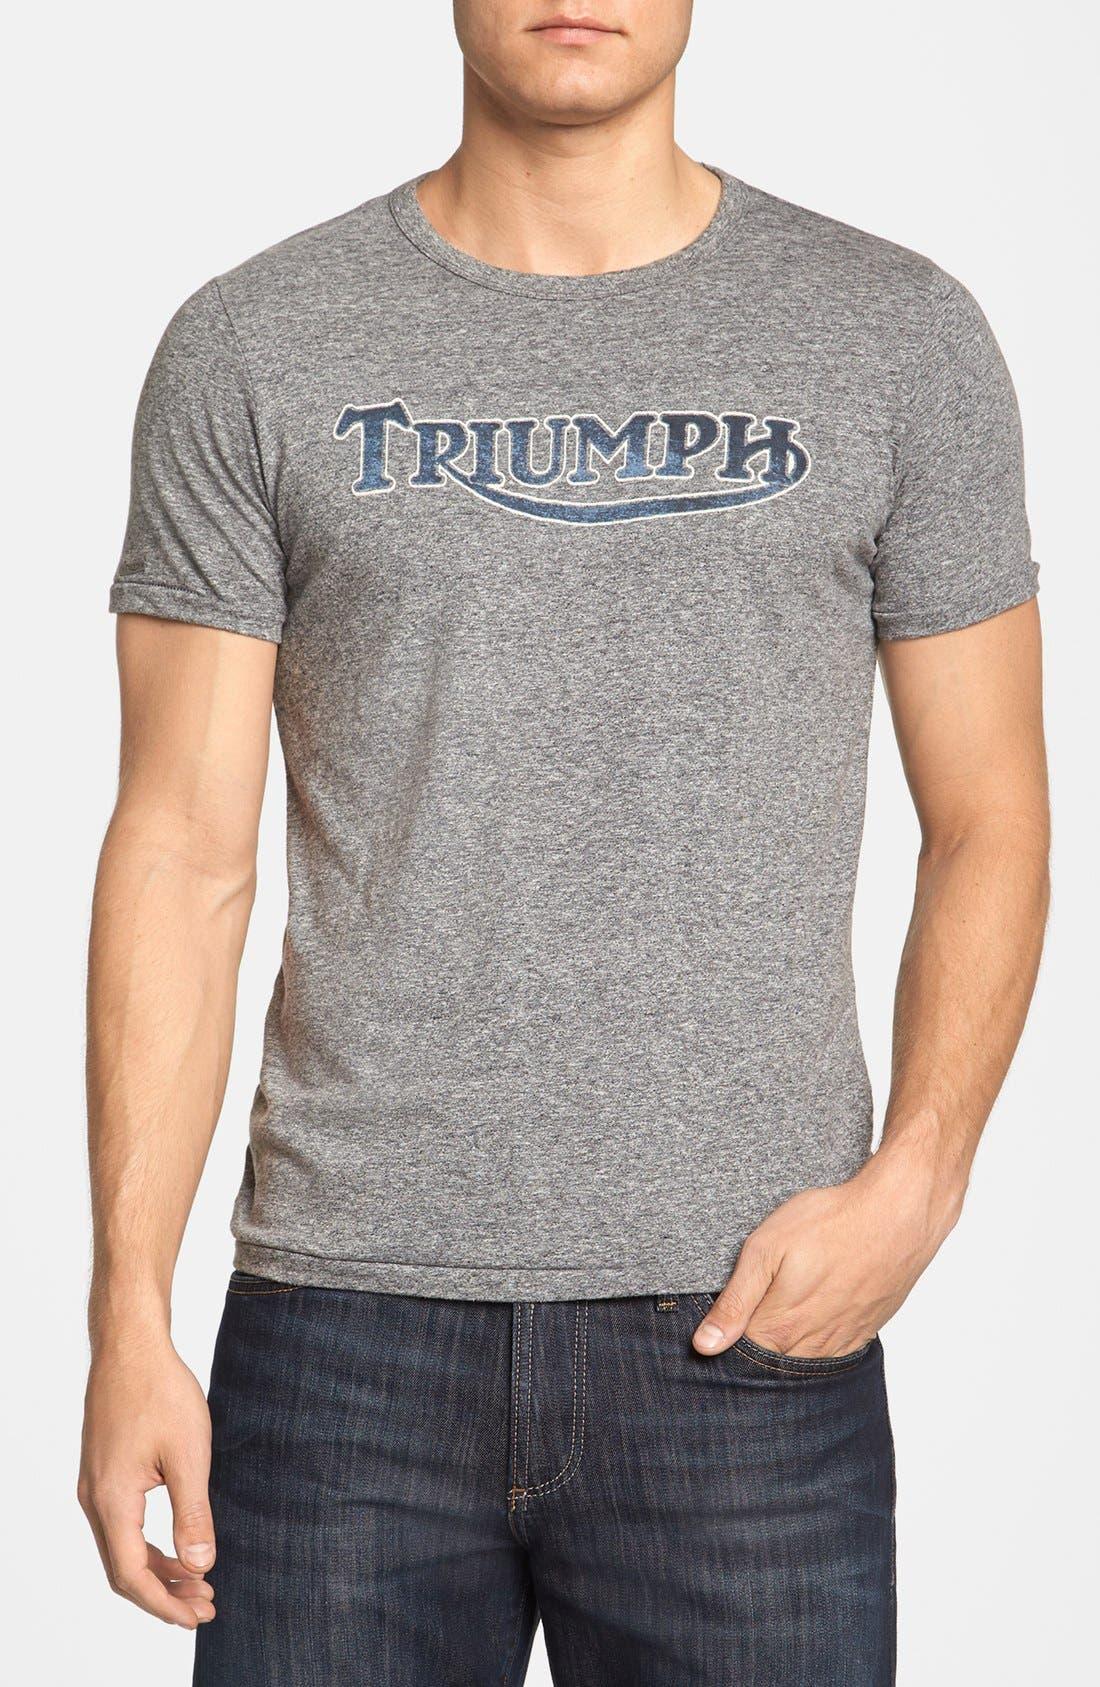 Main Image - Lucky Brand 'Triumph' T-Shirt